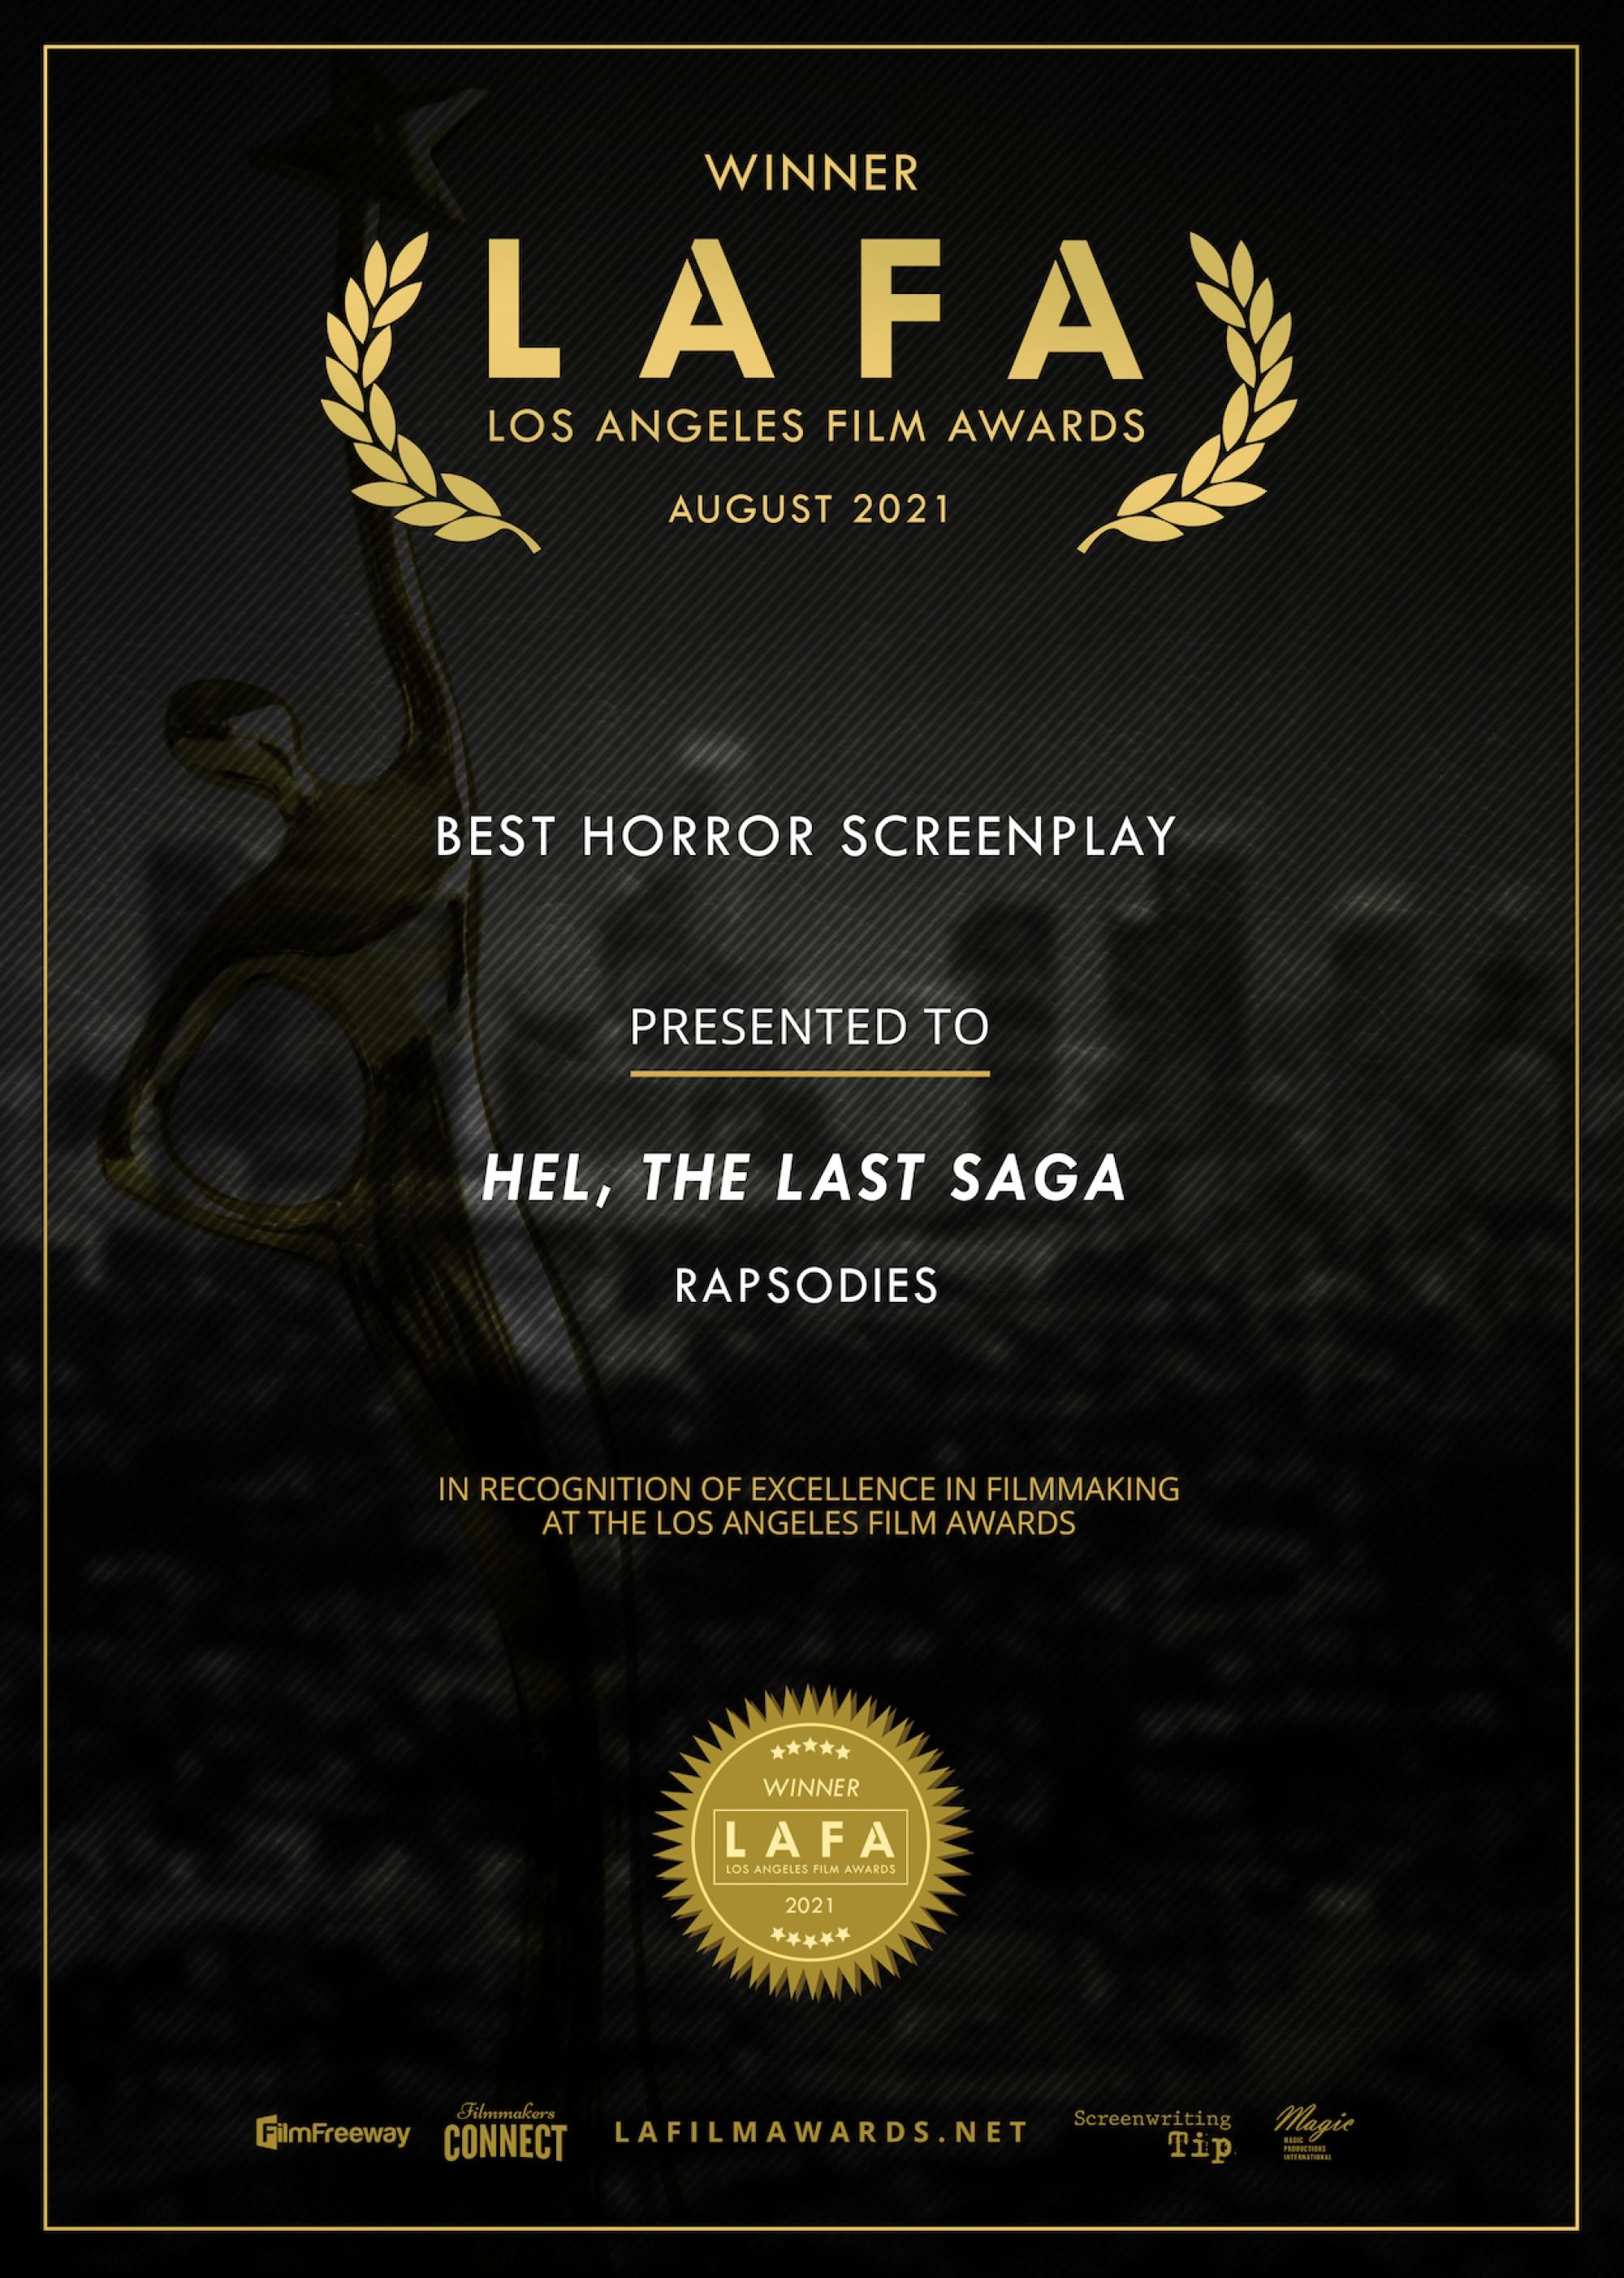 Hel, the last saga - Best Horror Screenplay